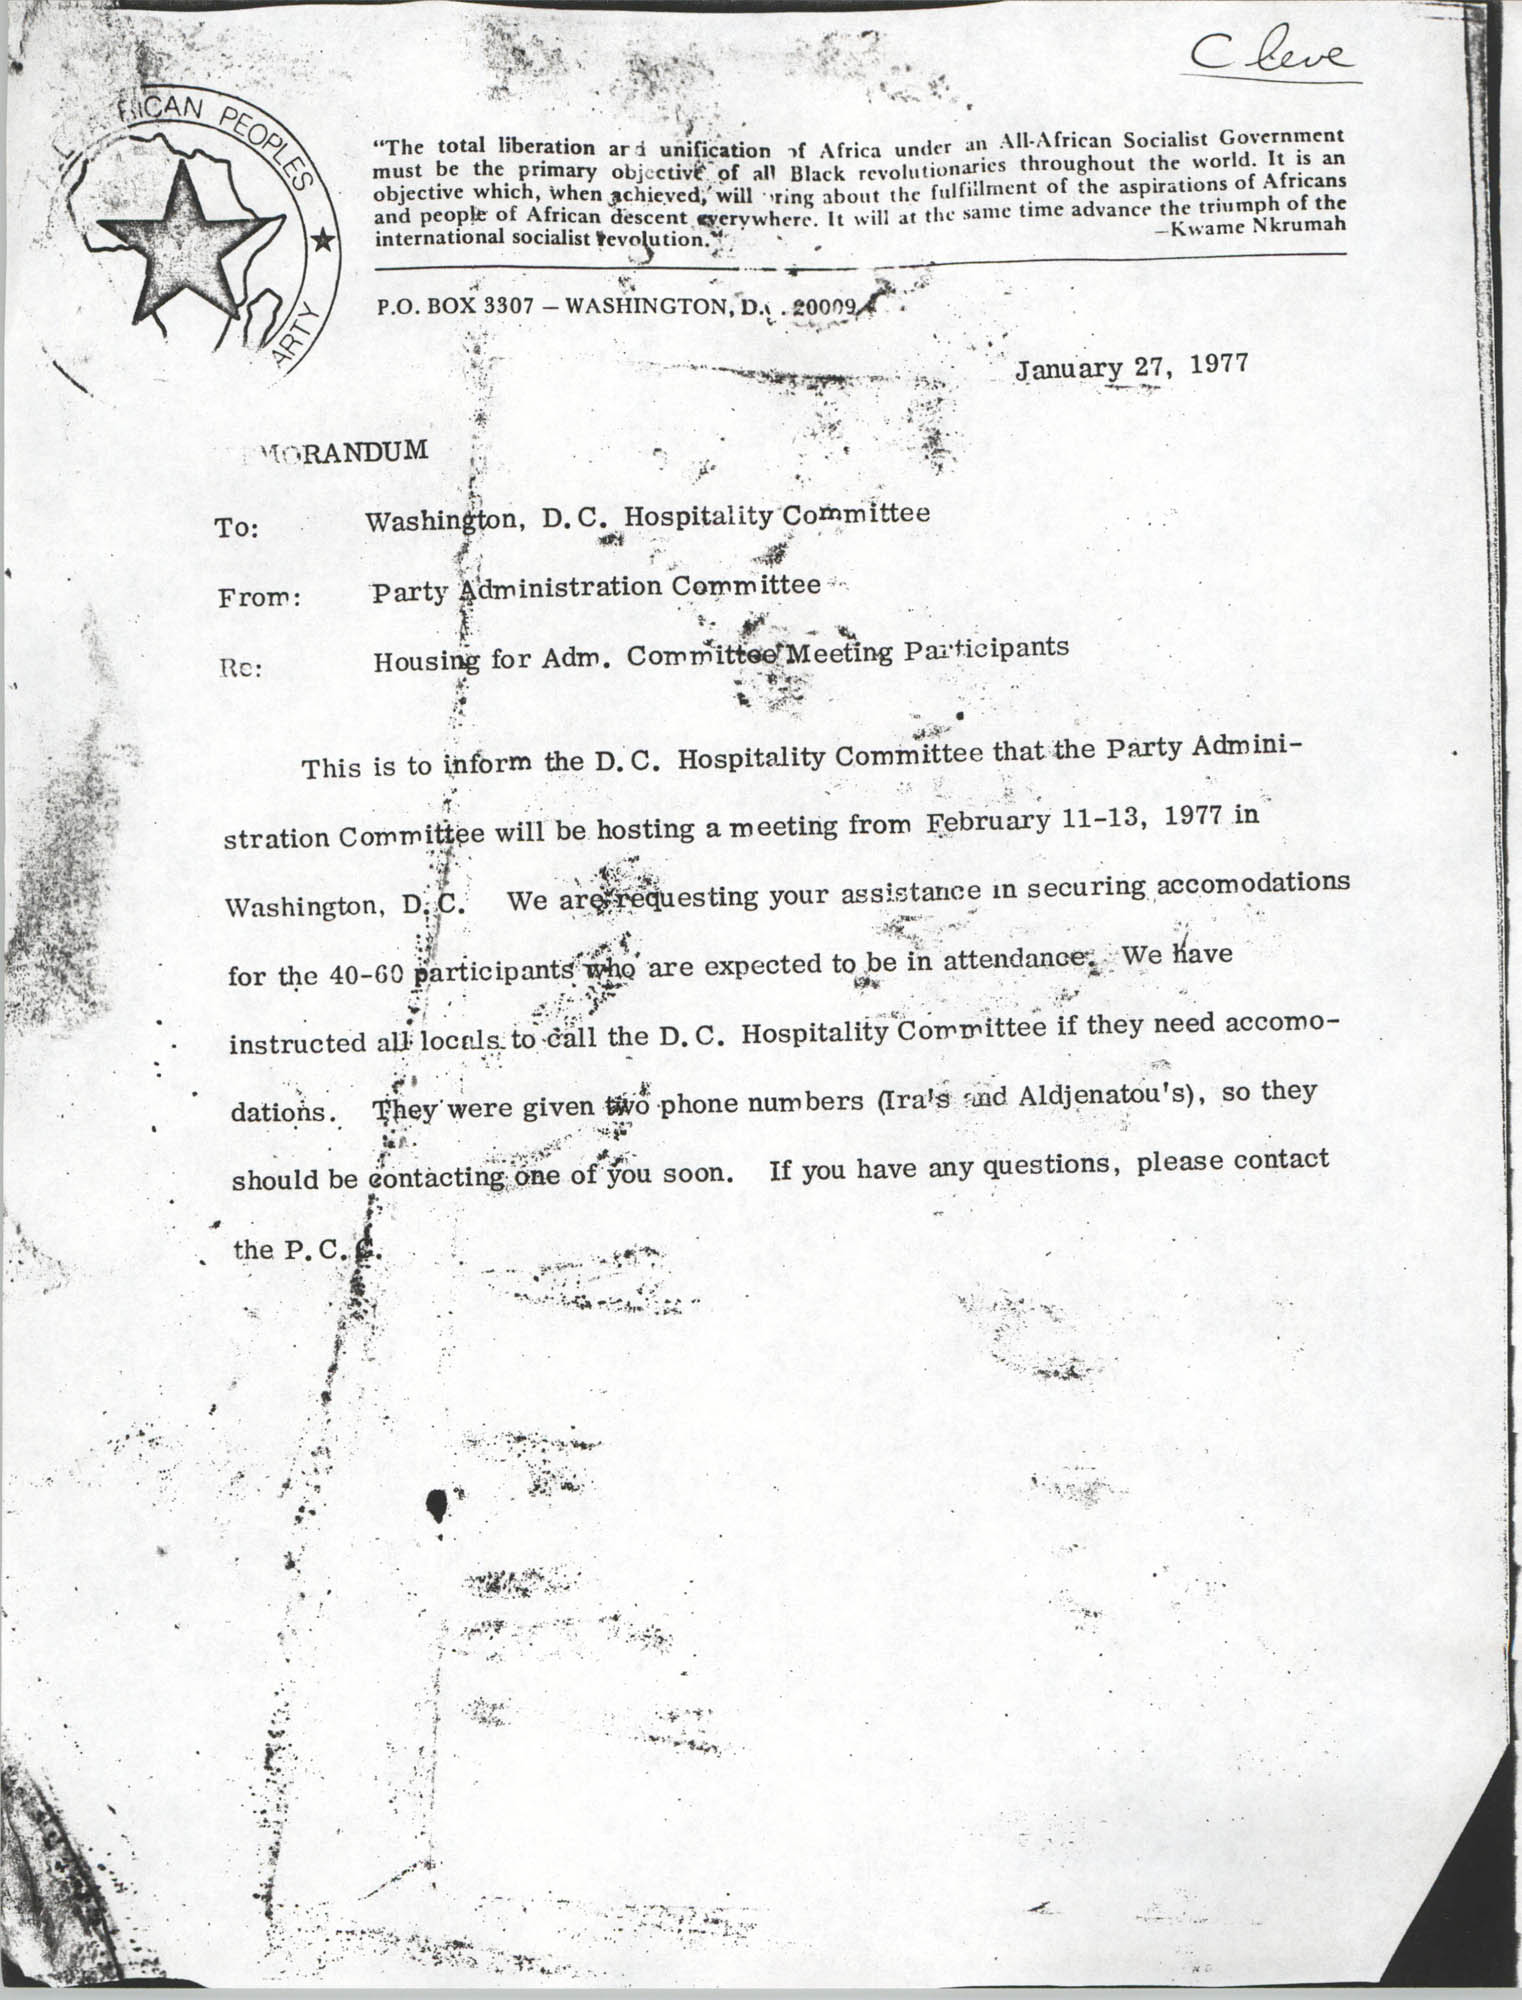 All African People's Revolutionary Party Memorandum, January 27, 1977